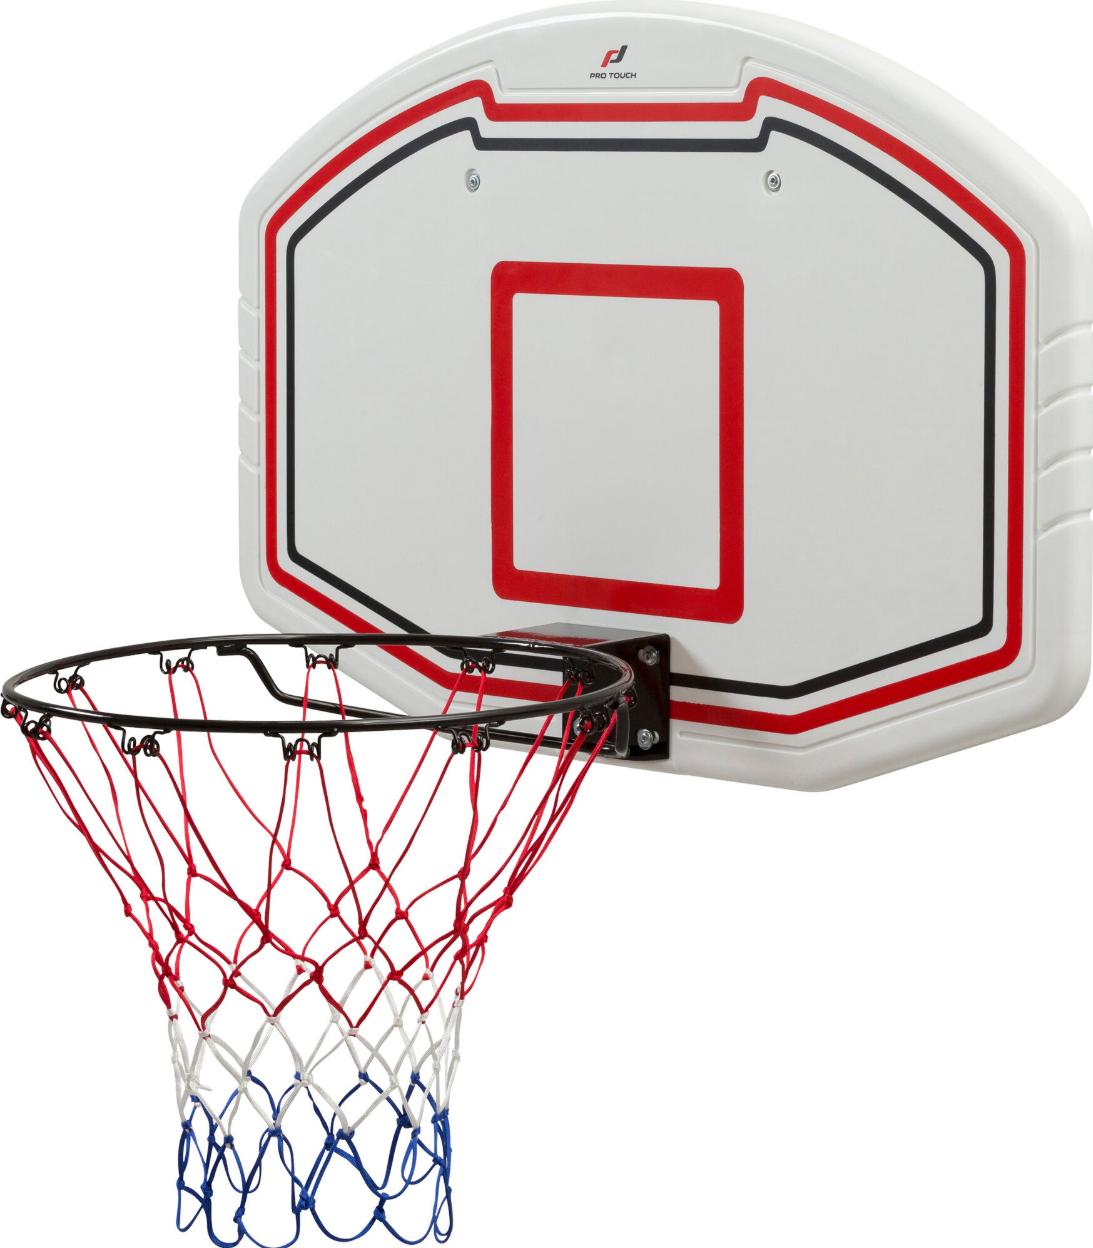 Pro Touch Harlem Basket